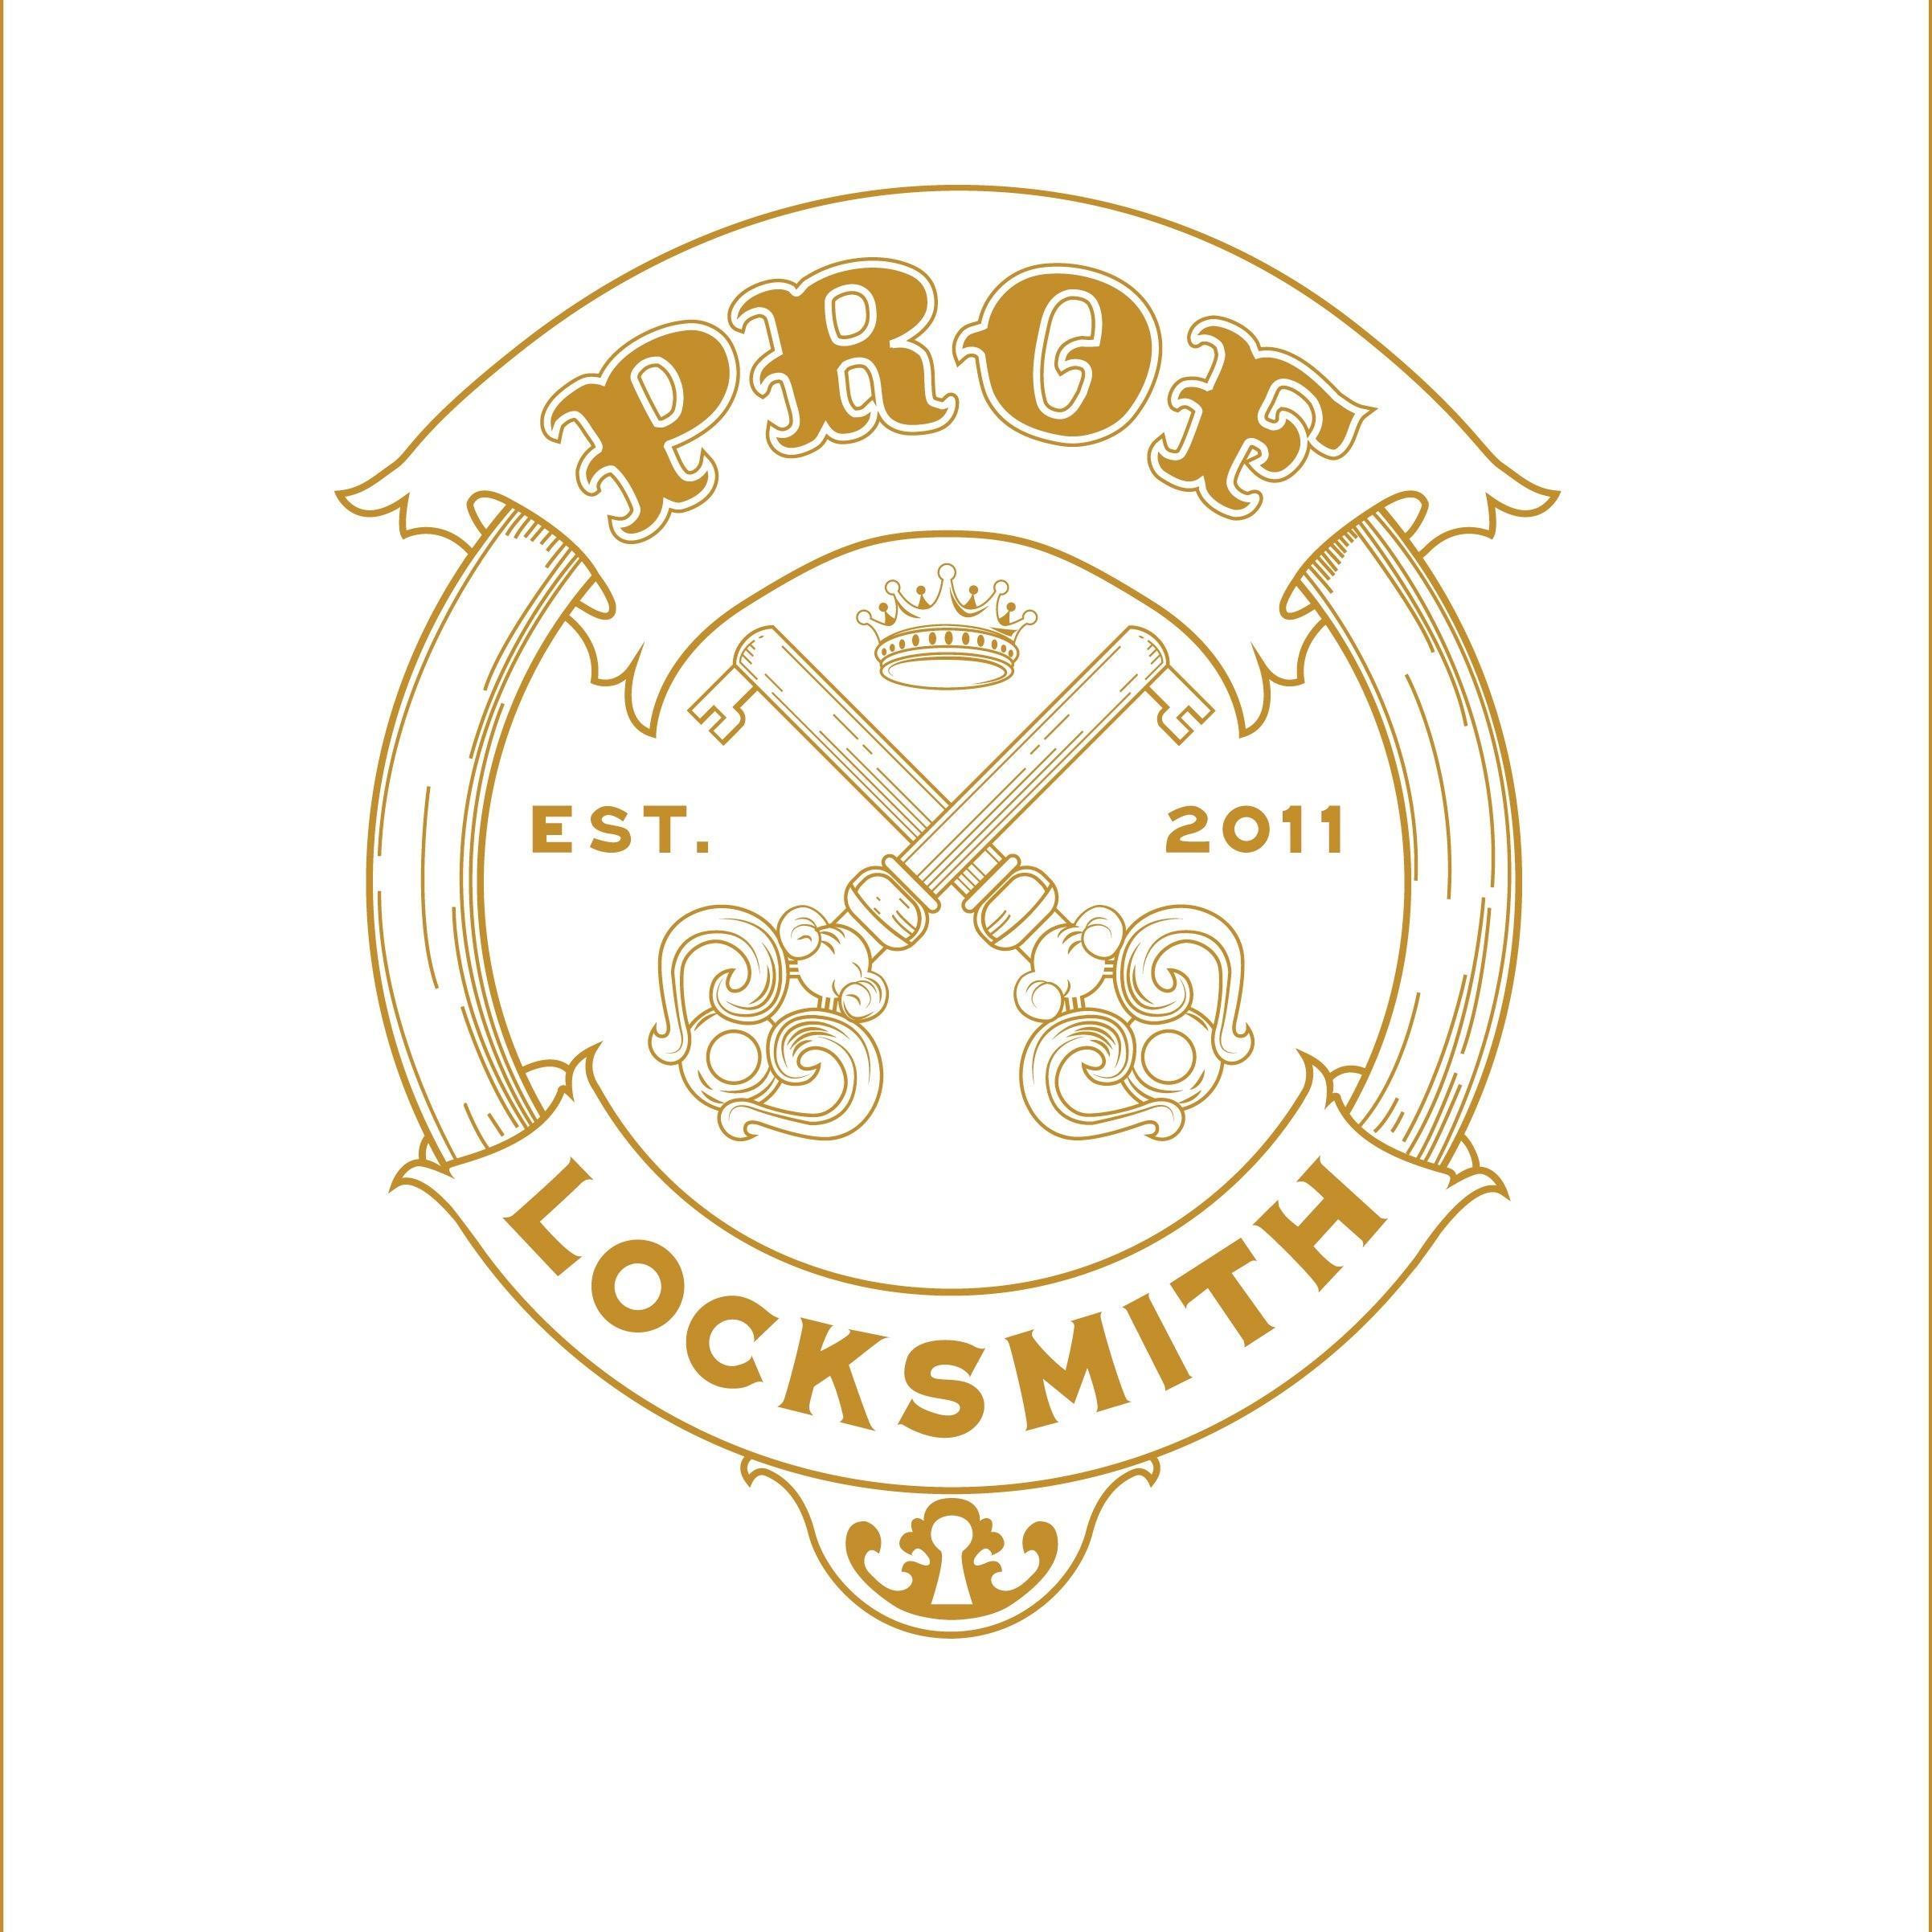 Prof Locksmith image 4